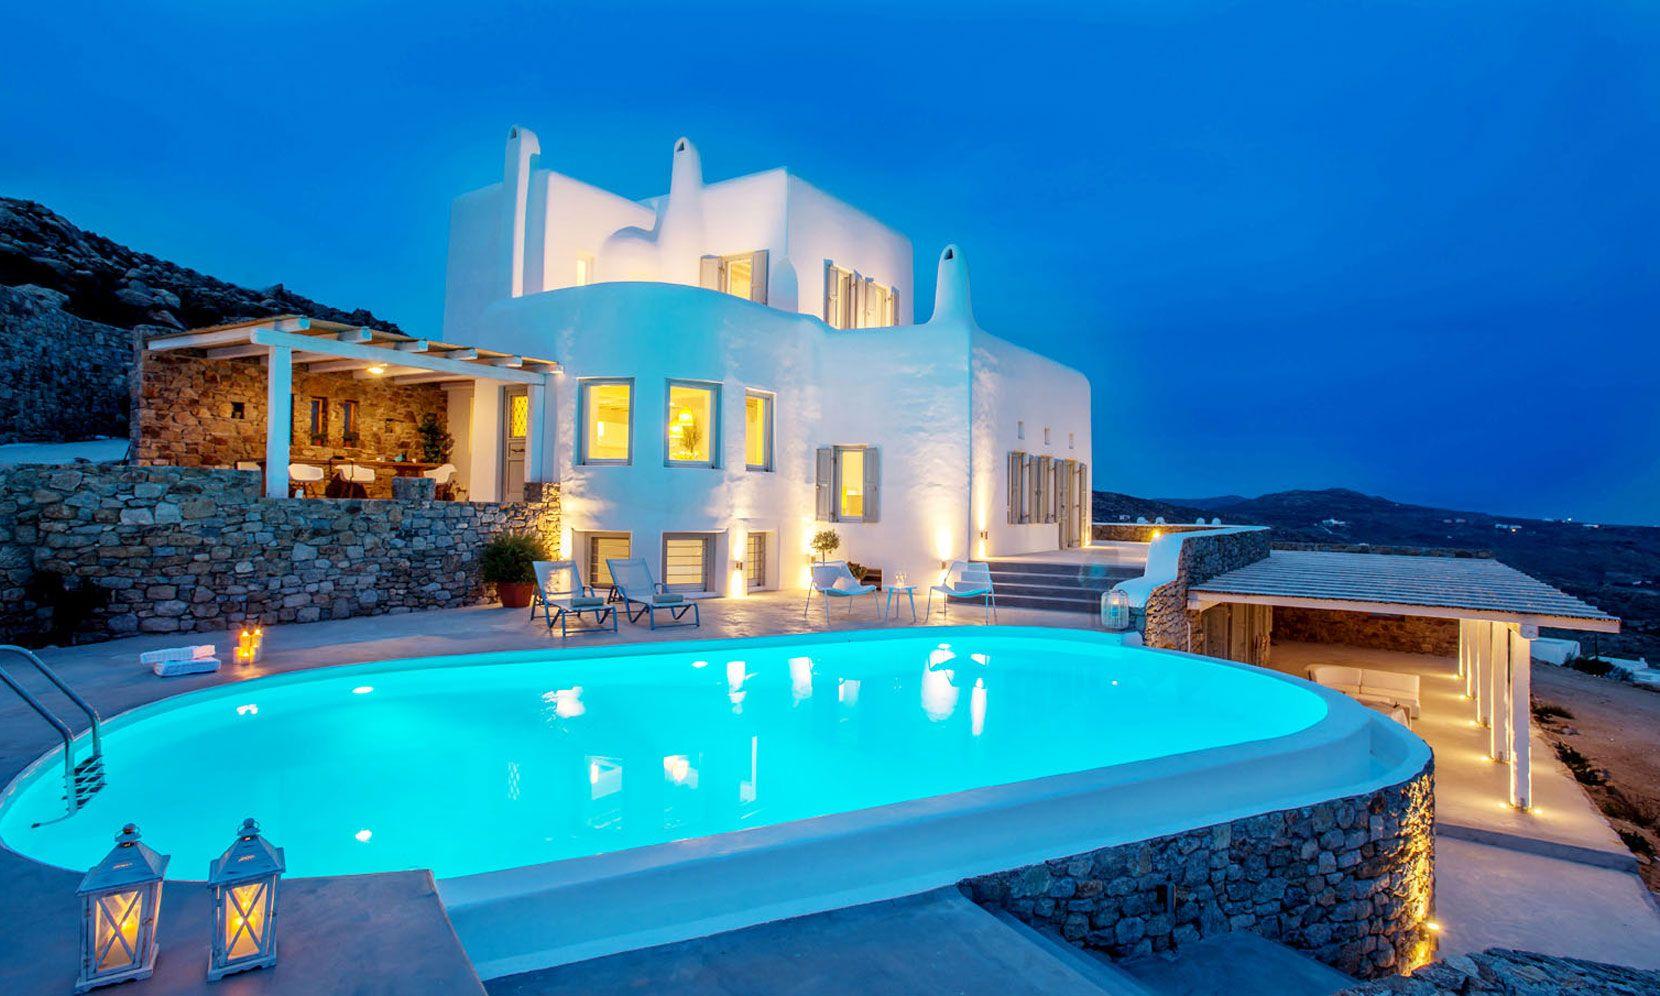 Mykonos Villa Andromeda jumbotron image